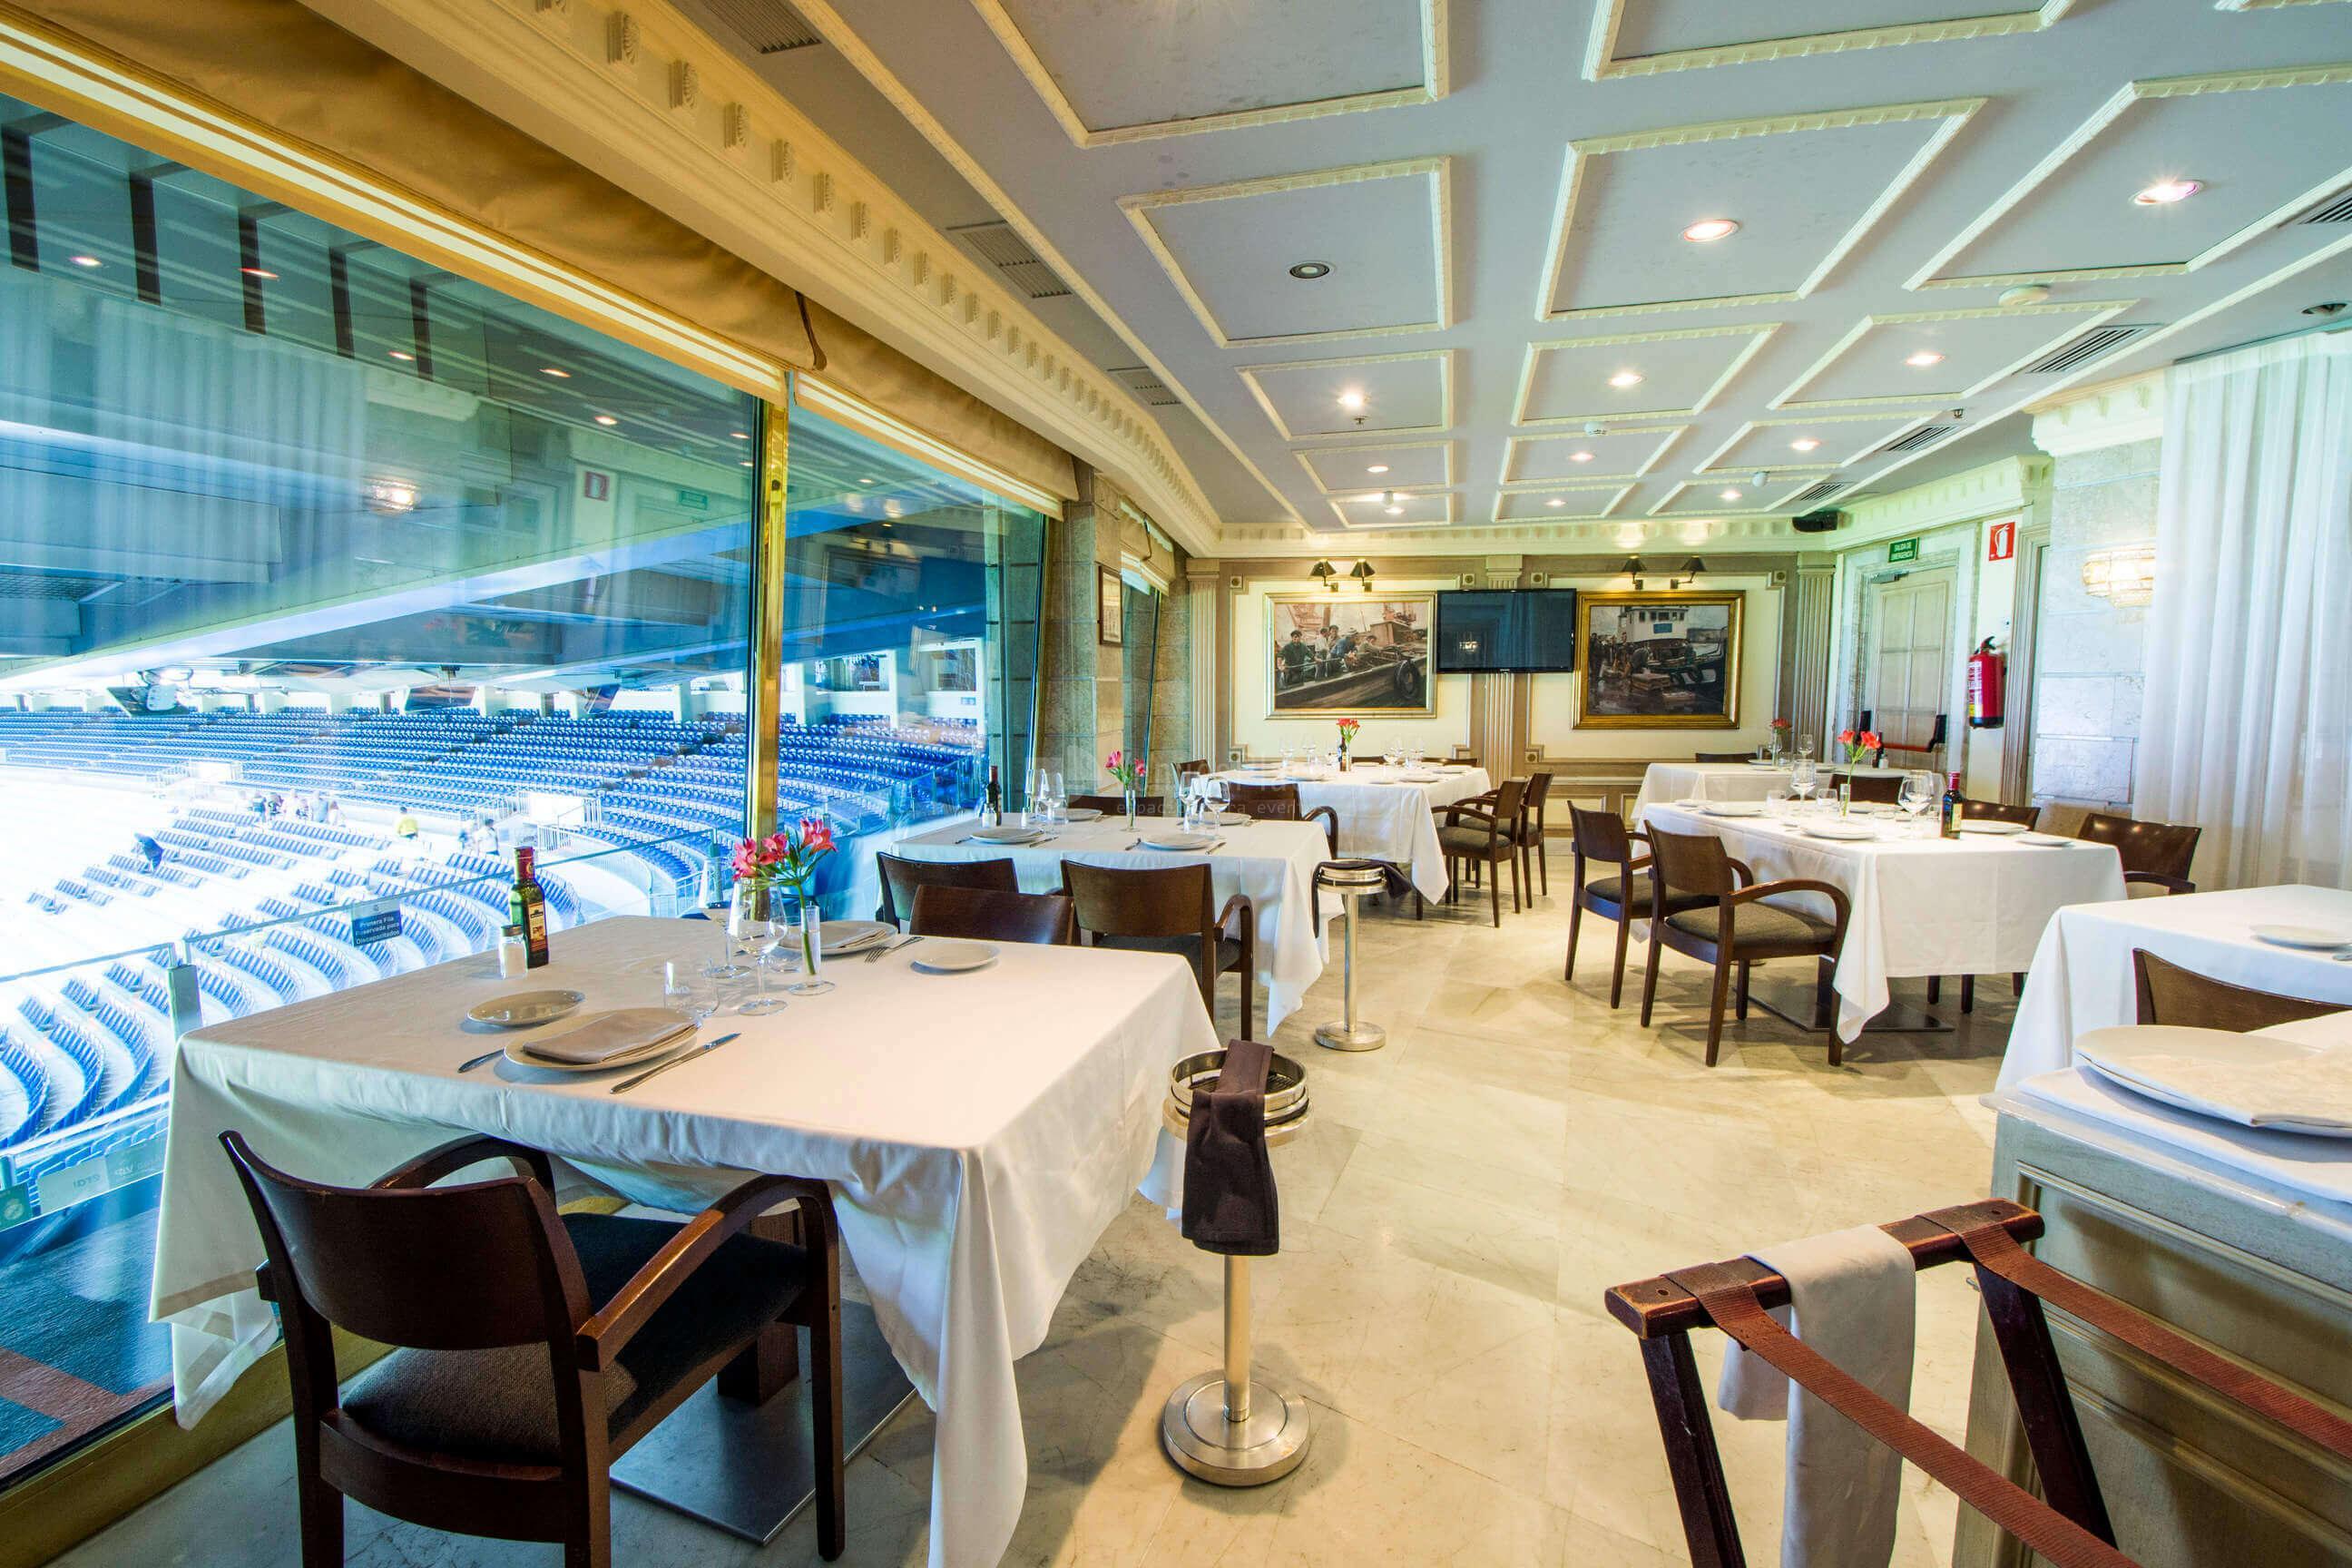 Restaurante puerta 57 grupo la m quina eventos exclusivos venuesplace - Restaurante puerta 57 madrid ...